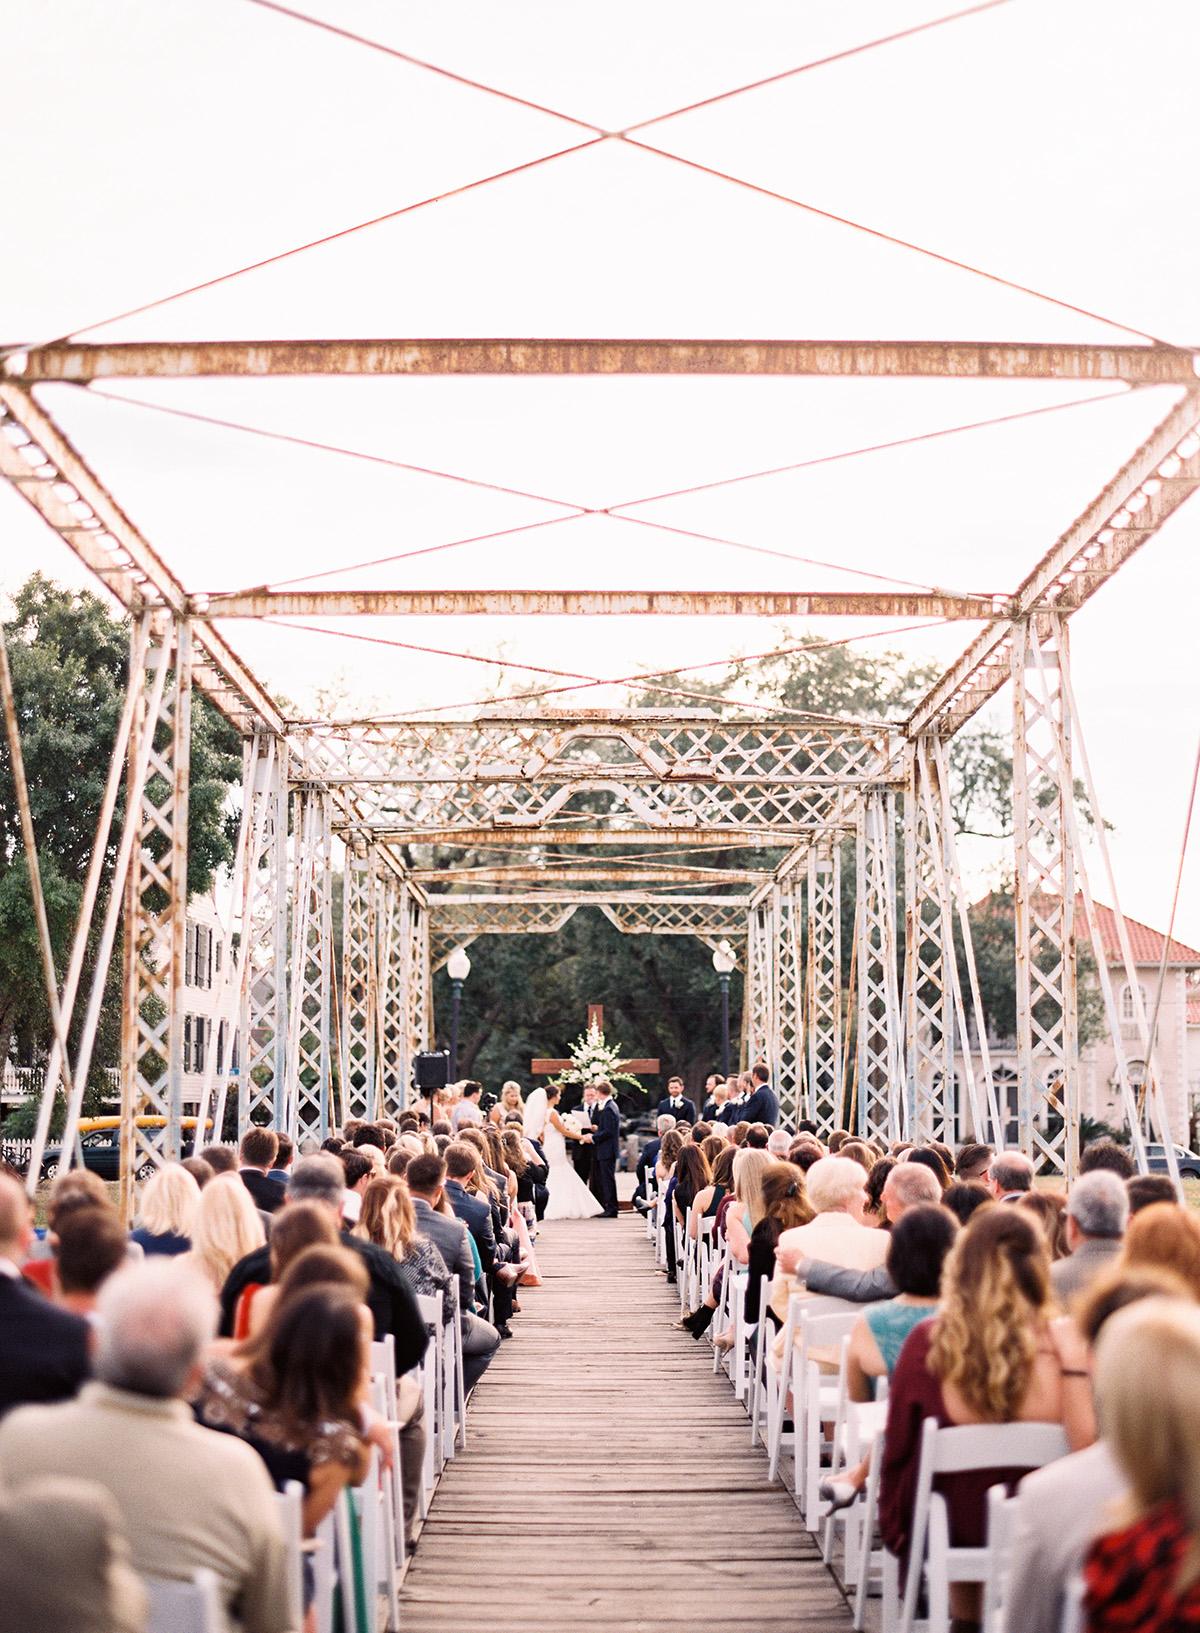 A wedding ceremony on the Bayou St. John bridge in New Orleans. Photo: Mon Soleil